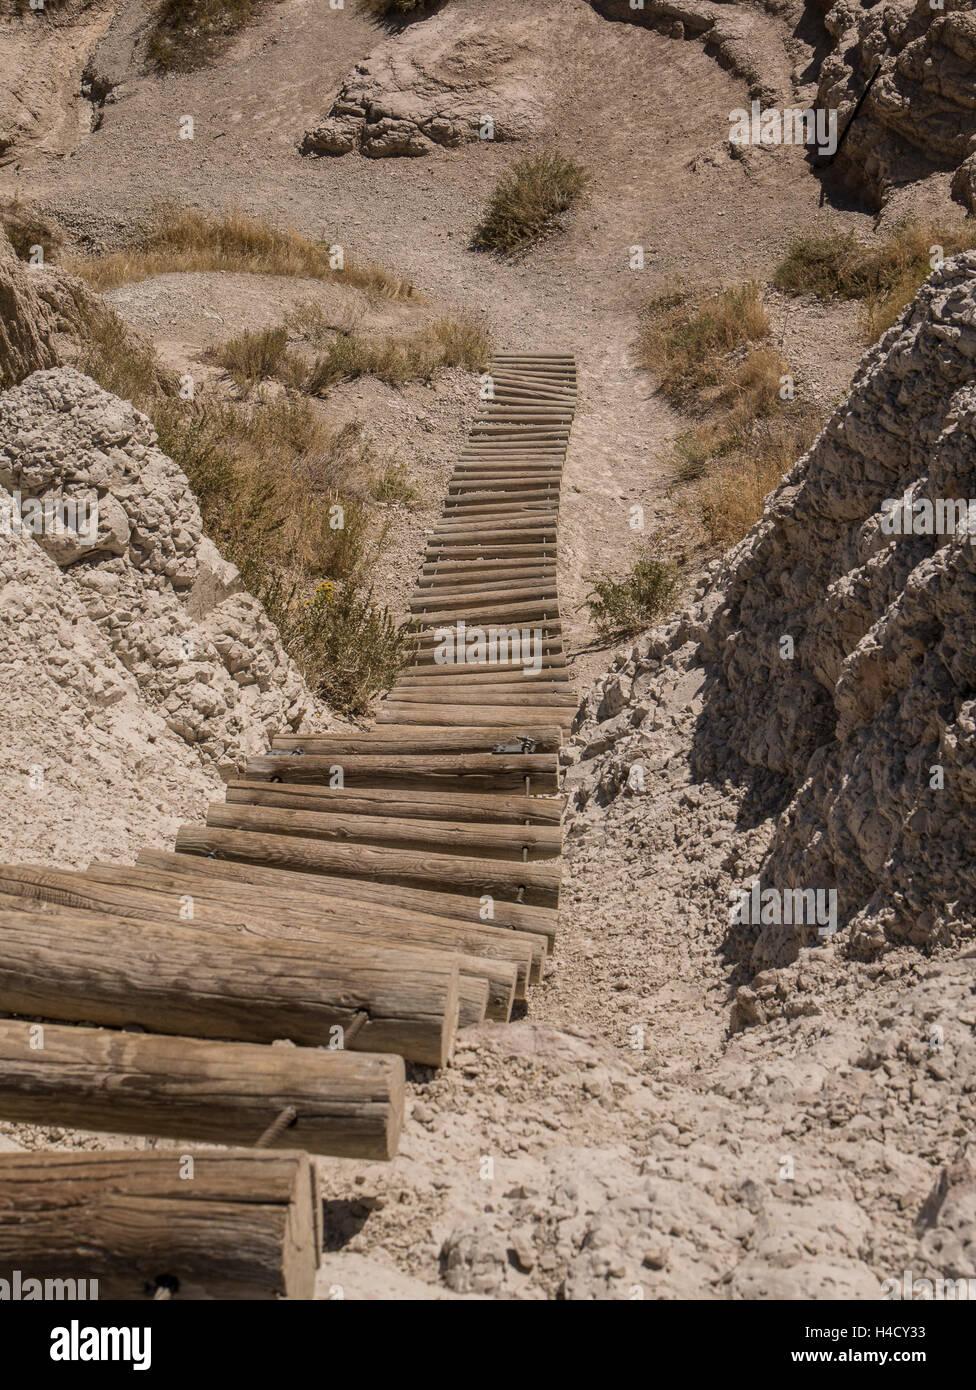 The Ladder on Notch Trail, Badlands National Park, South Dakota. - Stock Image